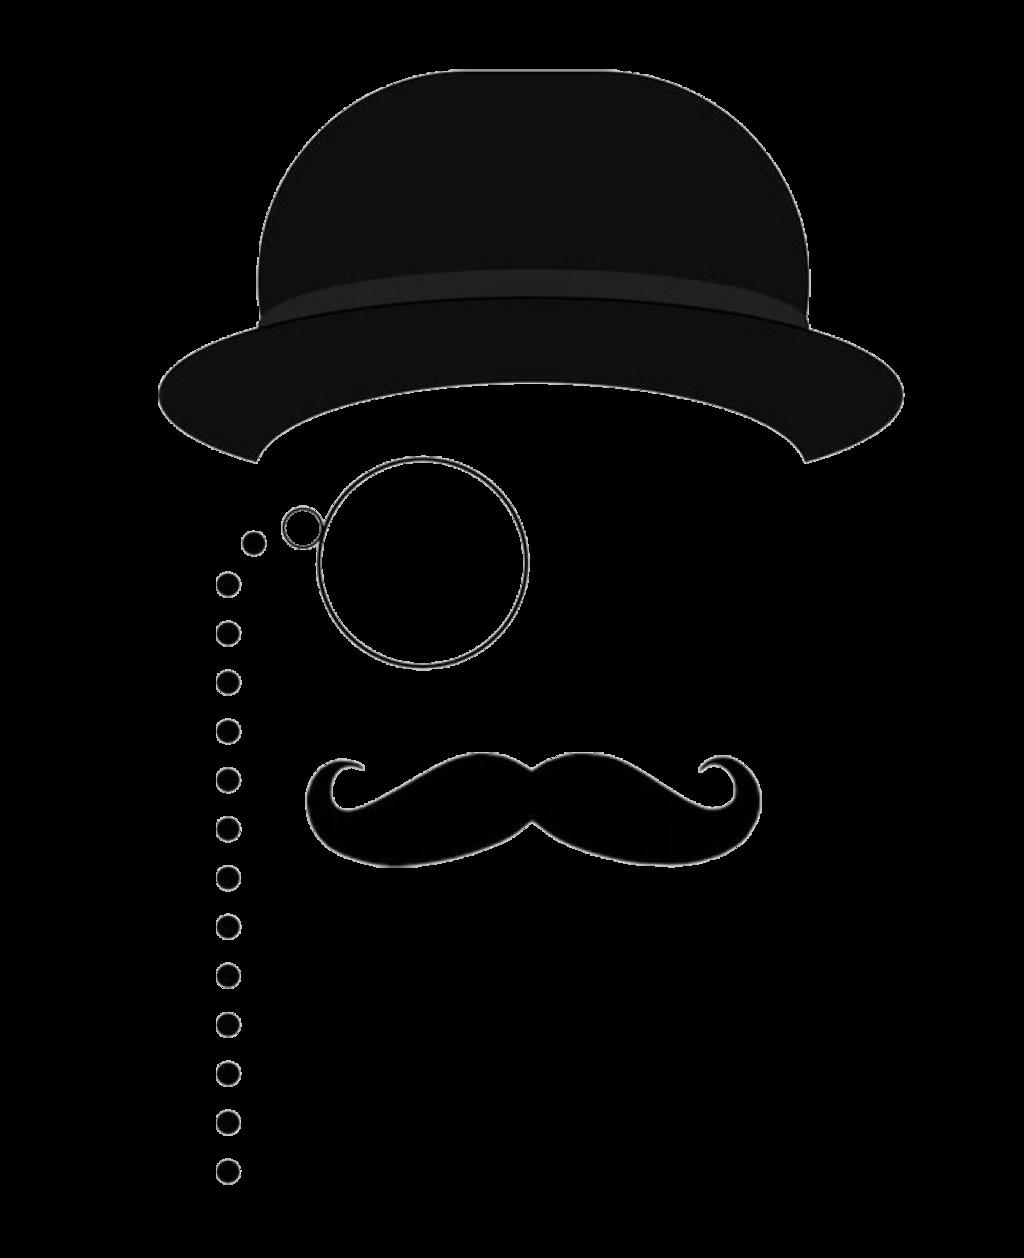 mustache hat bowlerhat monocle silhouette man blackandw...